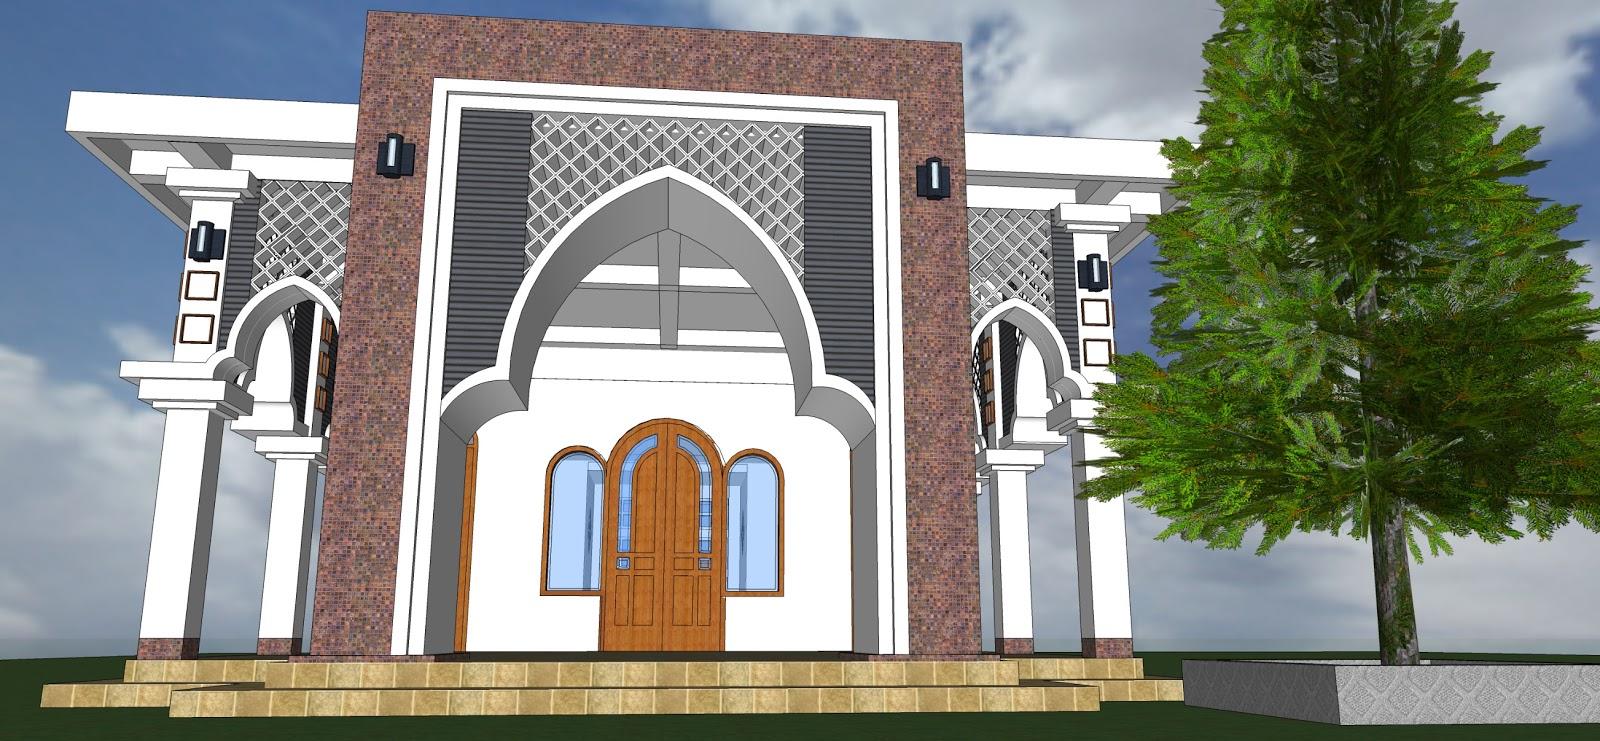 30 Model Masjid Minimalis Dengan Model Masjid Modern dari ...